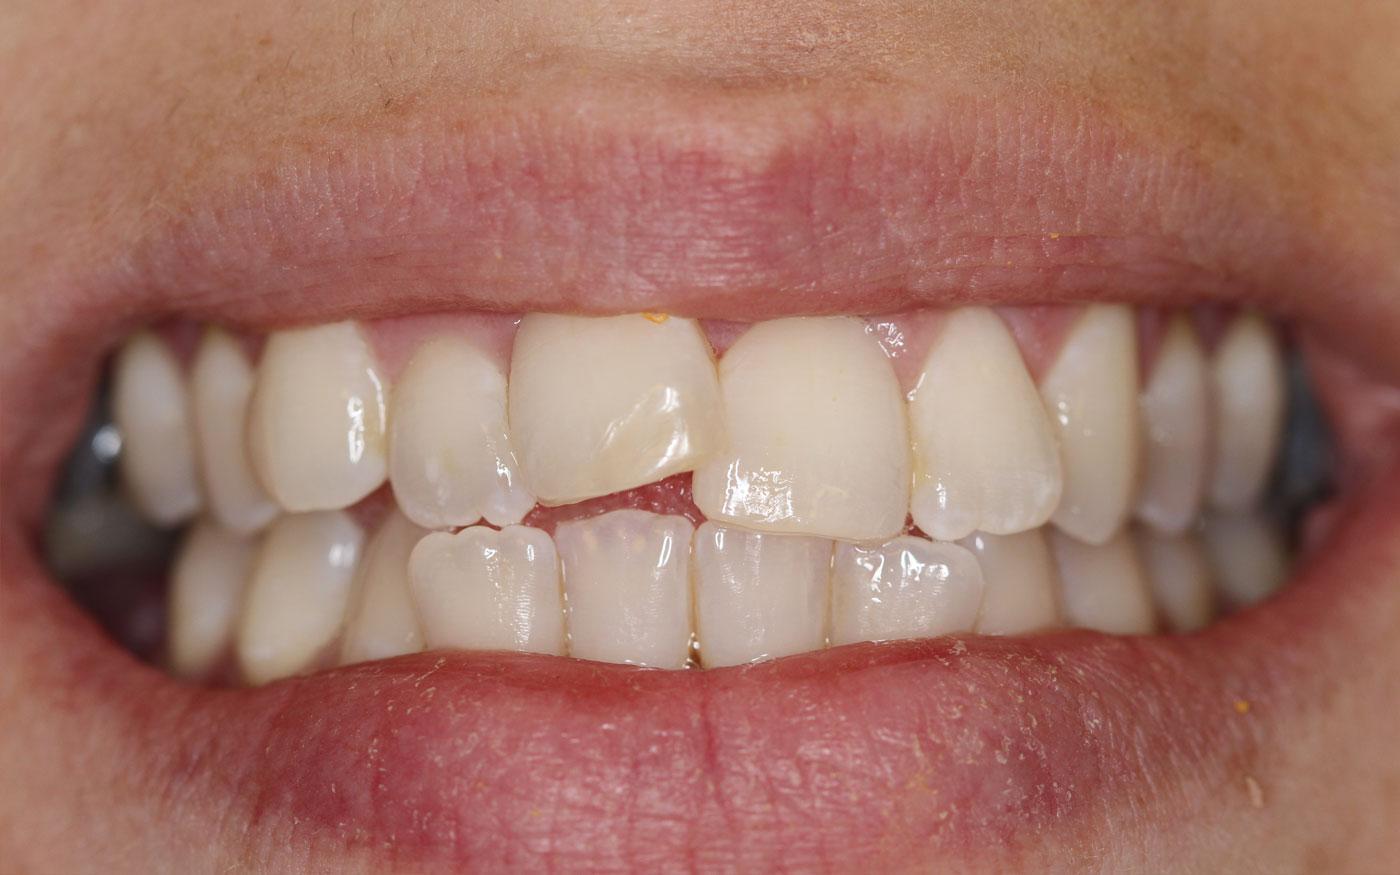 Orthodontics - Clear Aligner - Case 2